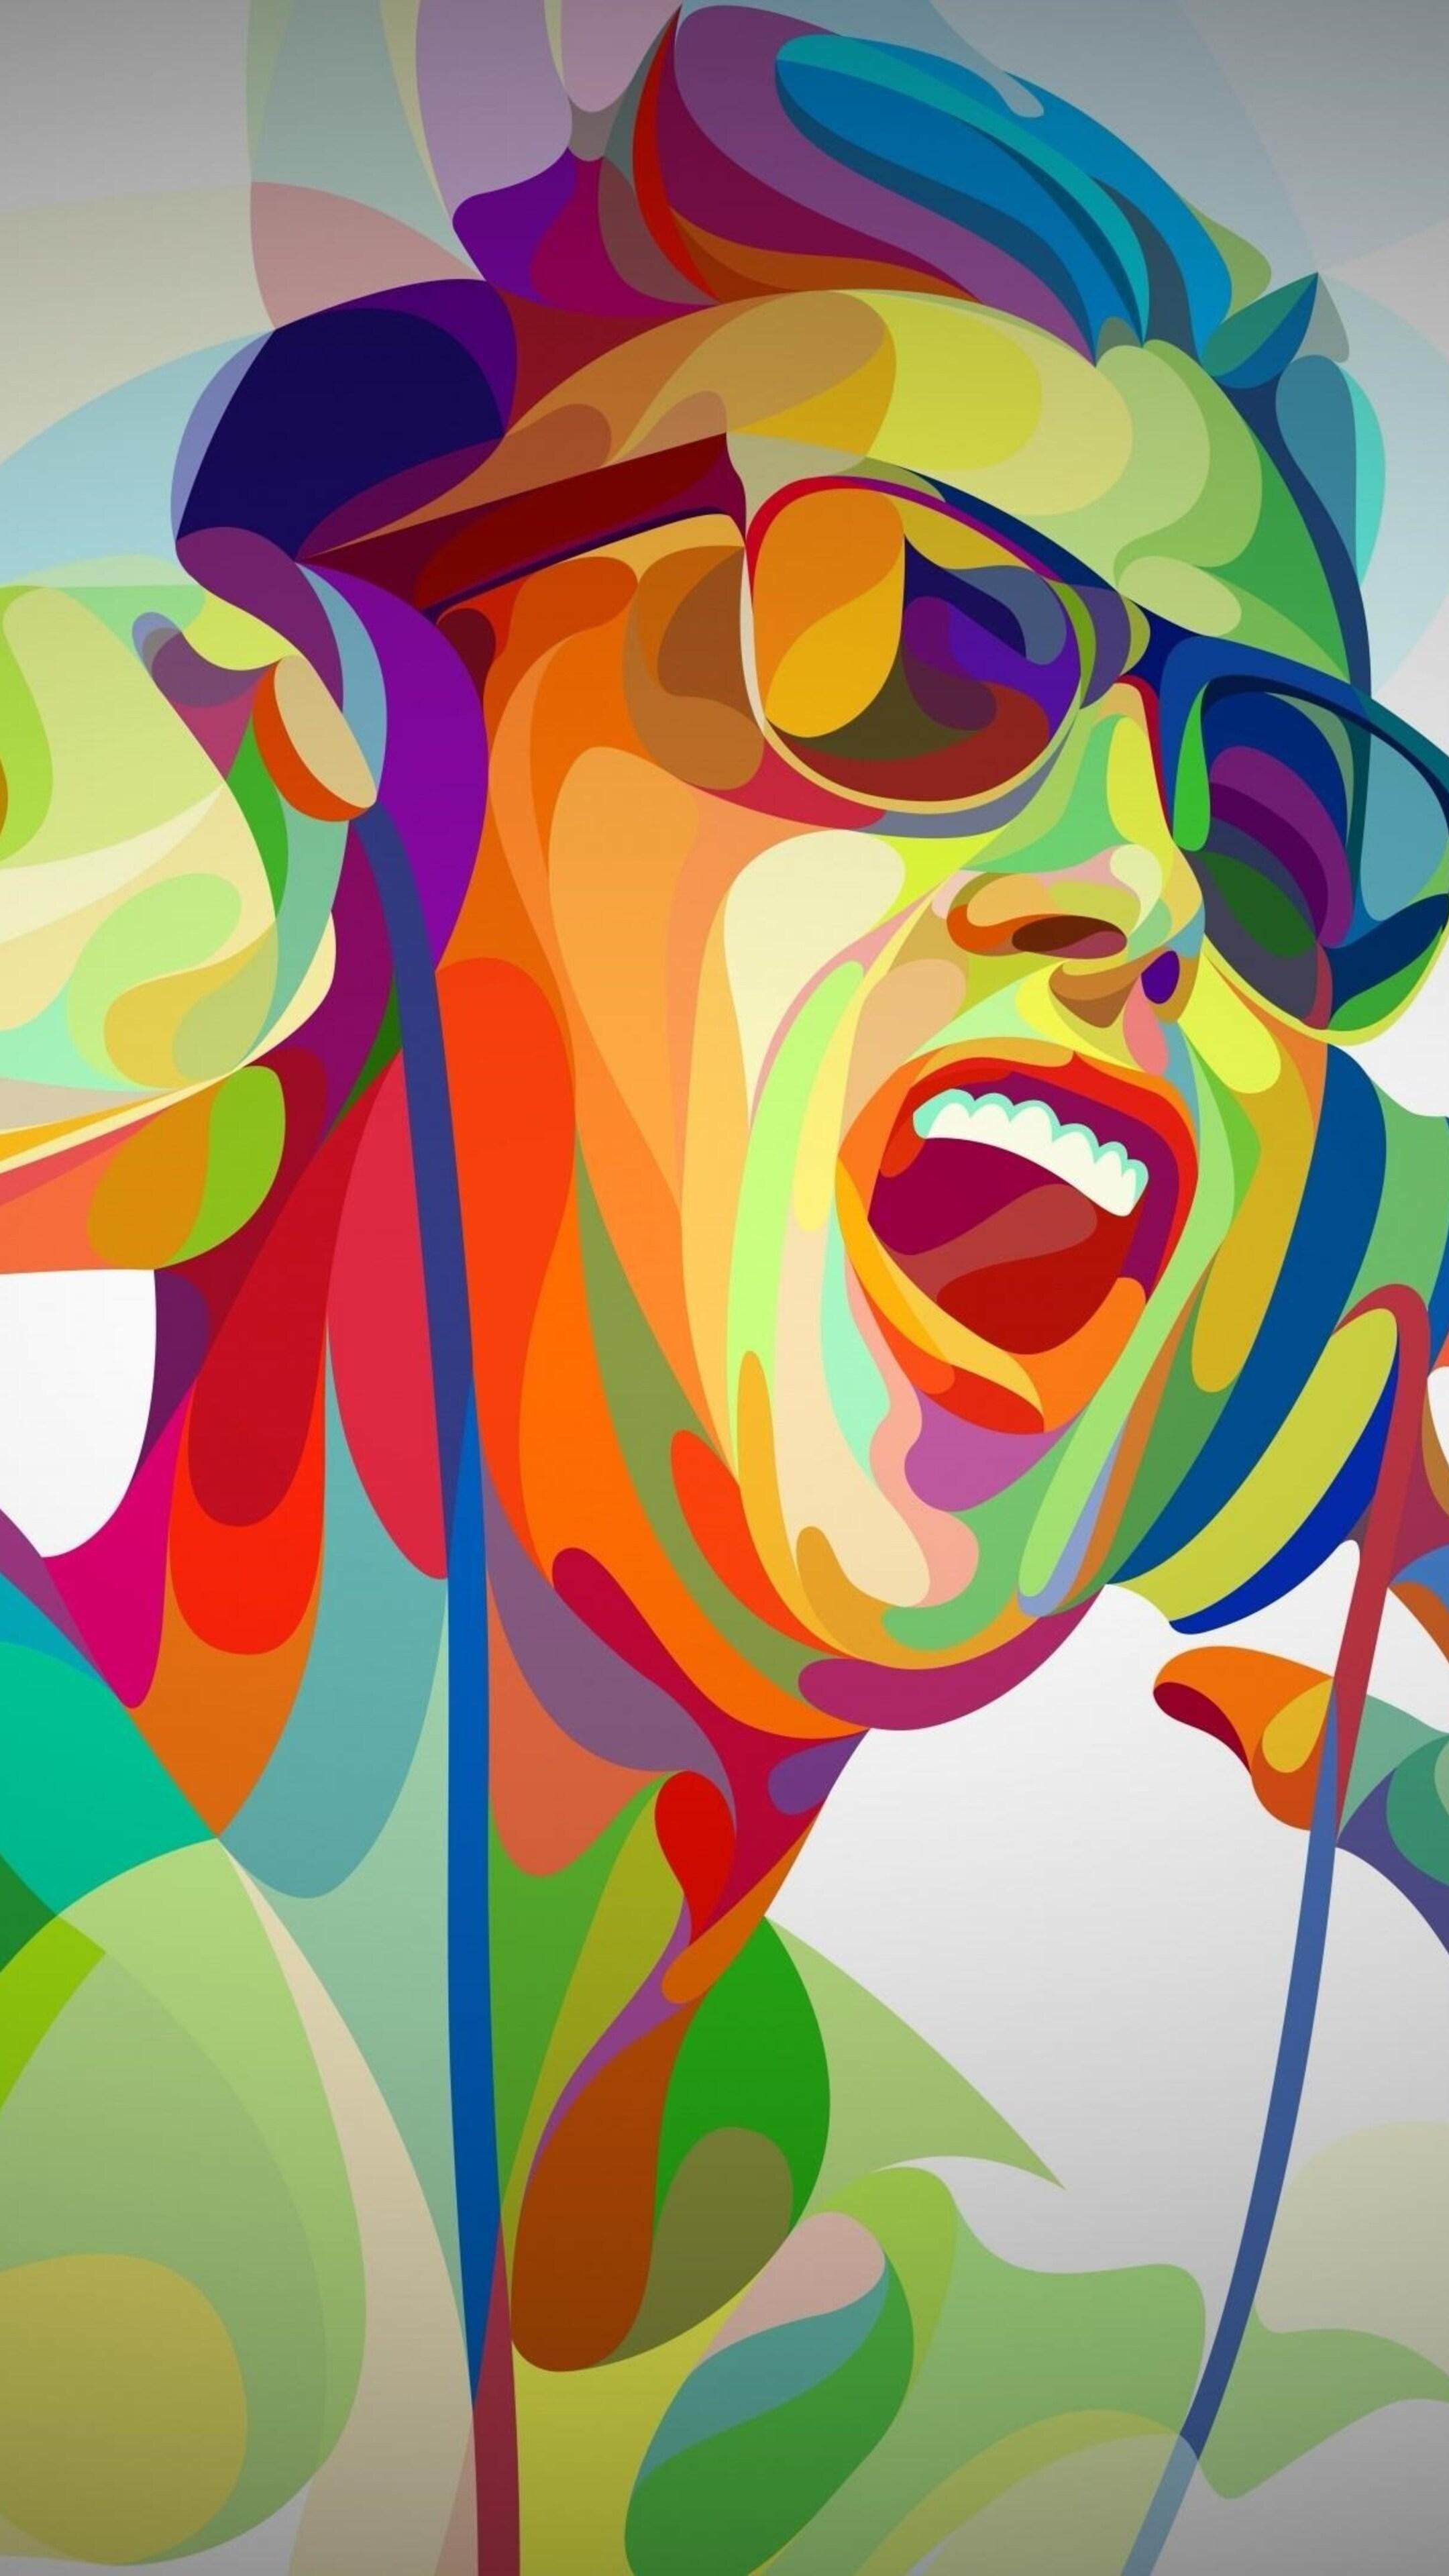 2160x3840 dj boy abstract art sony xperia x xz z5 premium - Art wallpaper 2160x3840 ...